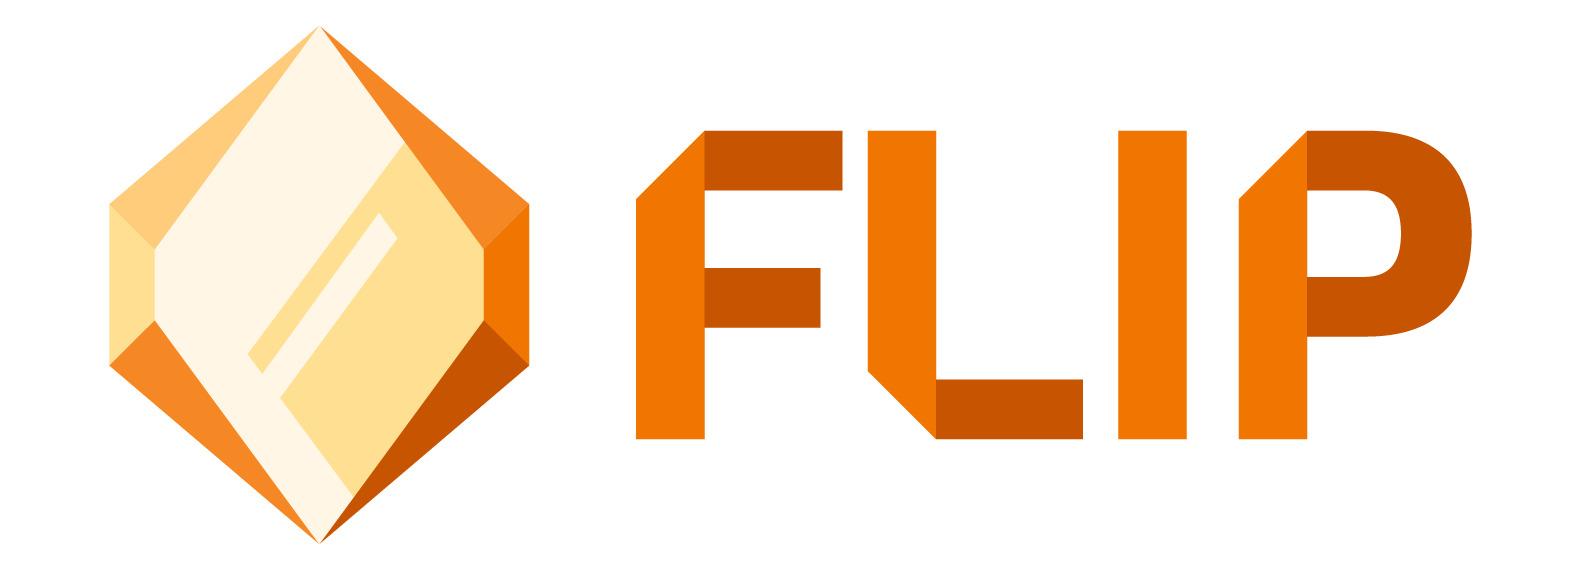 FLIP - what font is it?